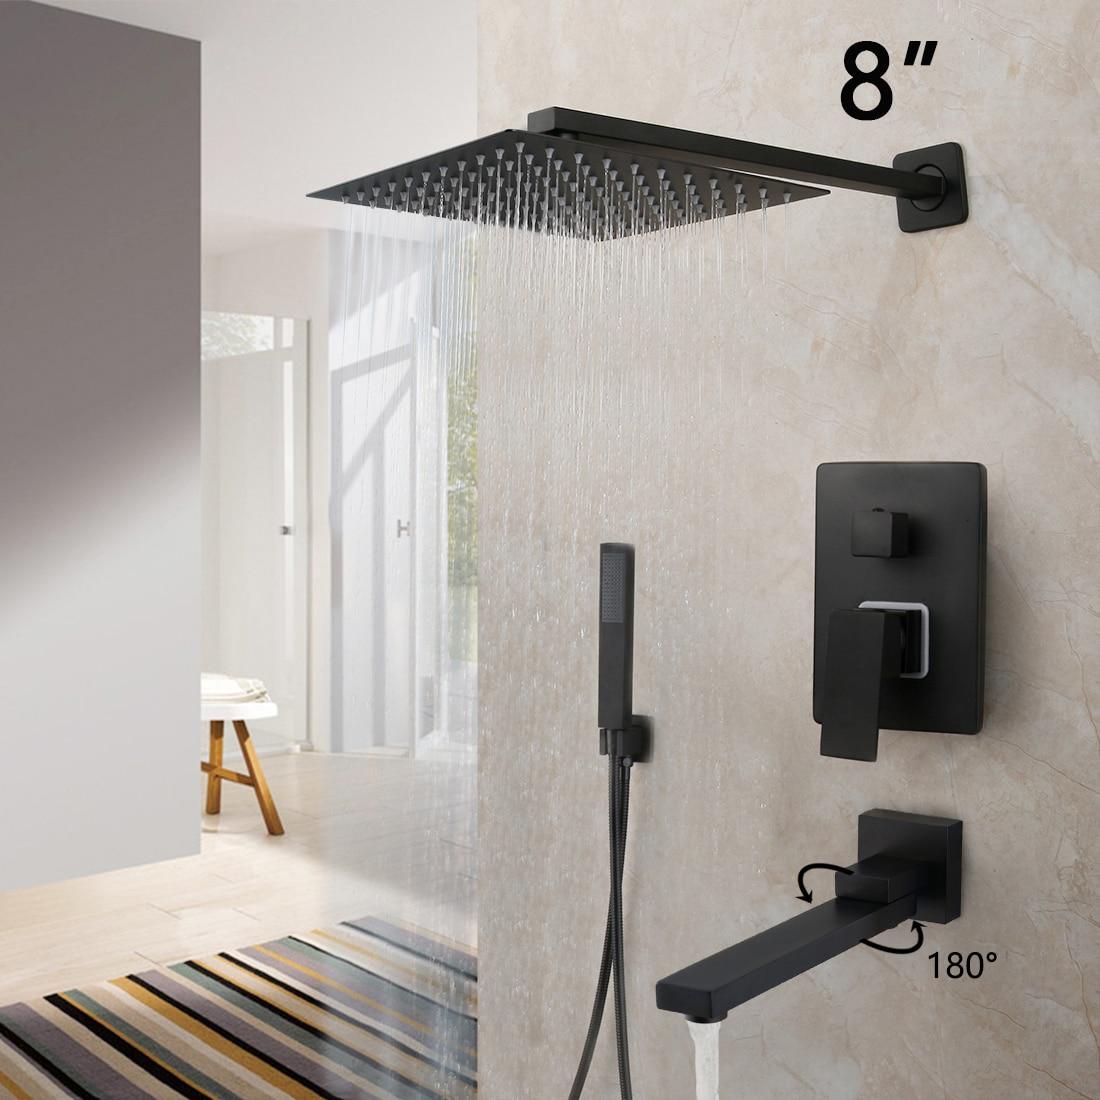 8 Inch Shower W2